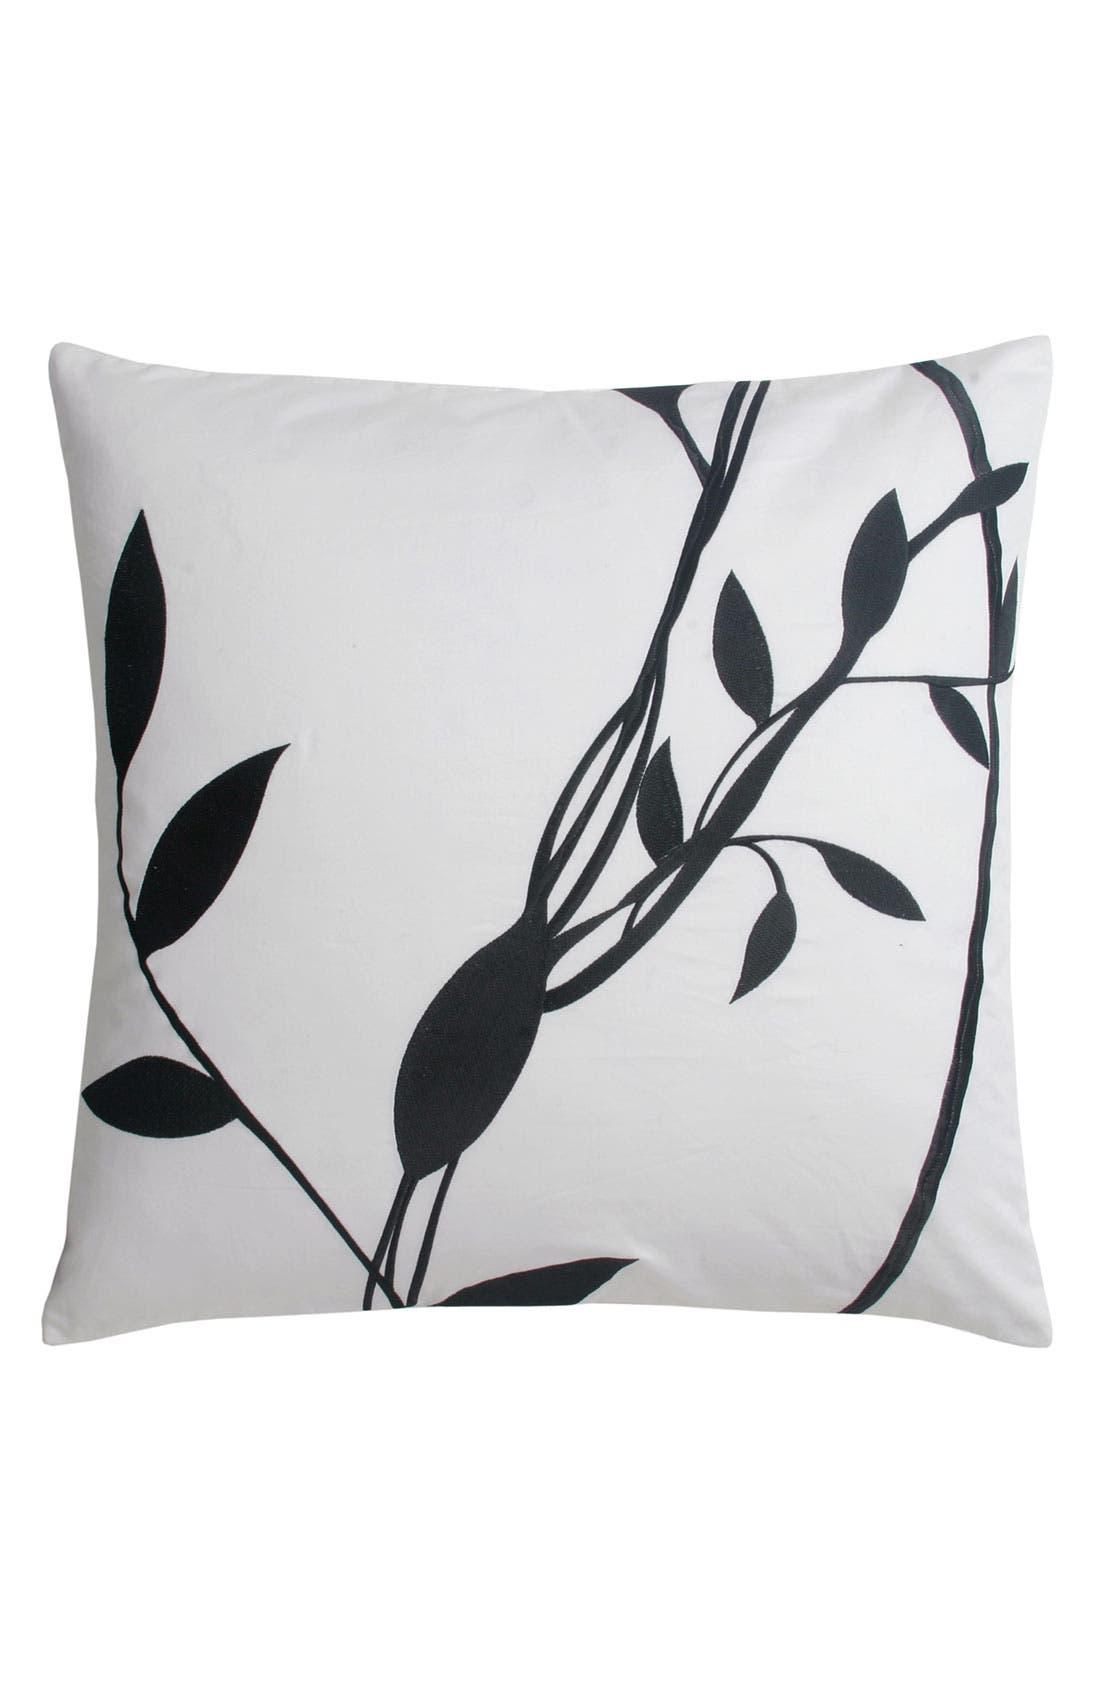 Main Image - Blissliving Home 'Manhattan' Pillow (Online Only)